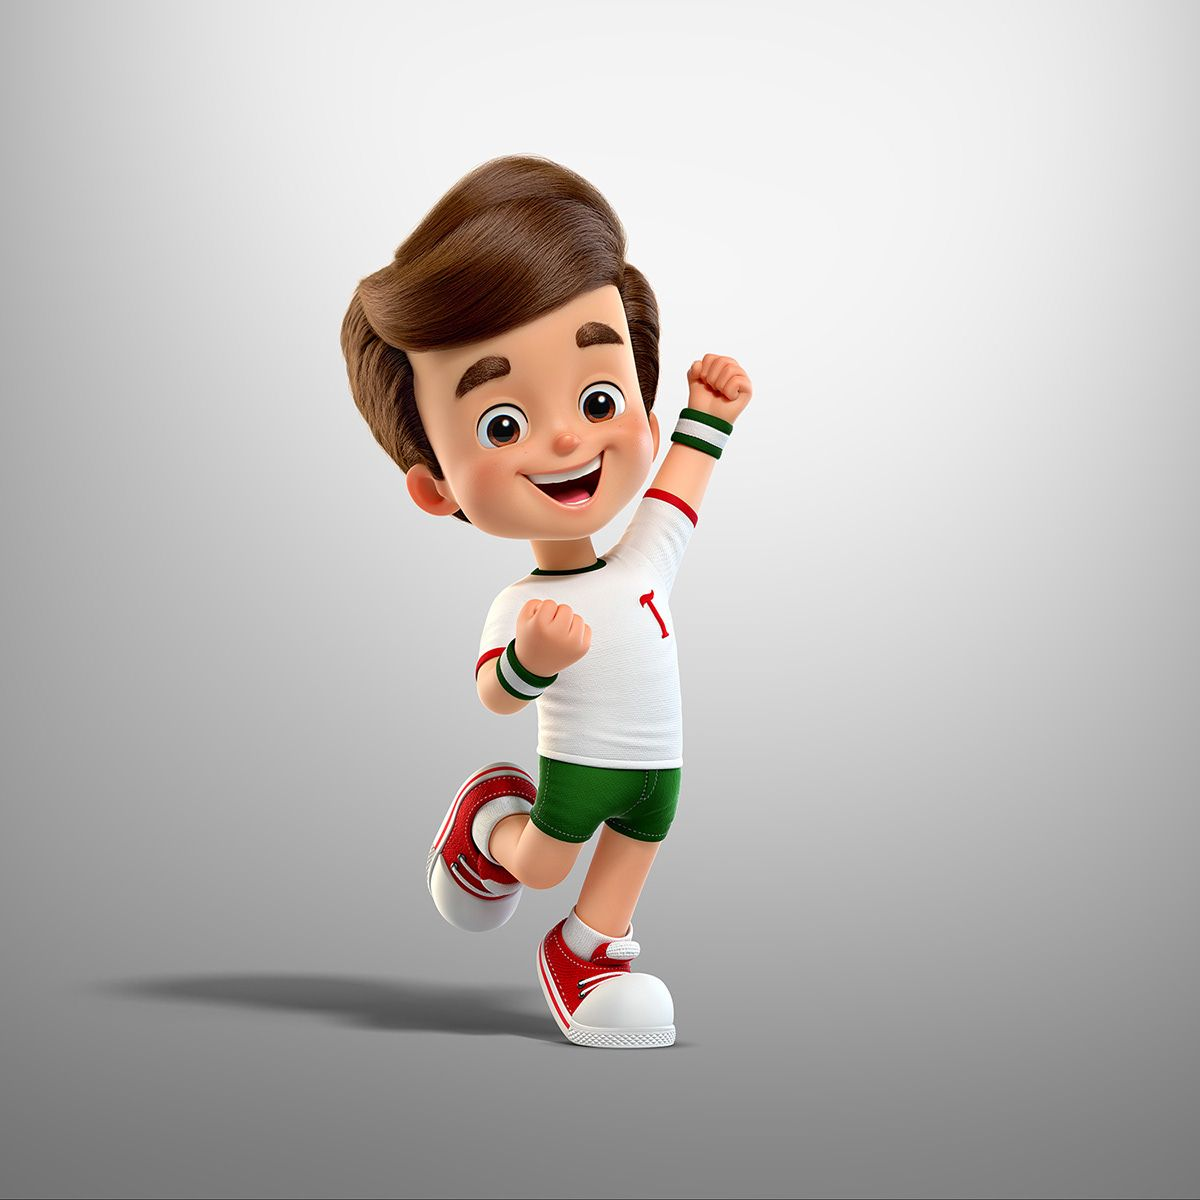 Tirolzinho On Behance Cute Cartoon Pictures Cute Cartoon Boy Baby Cartoon Drawing